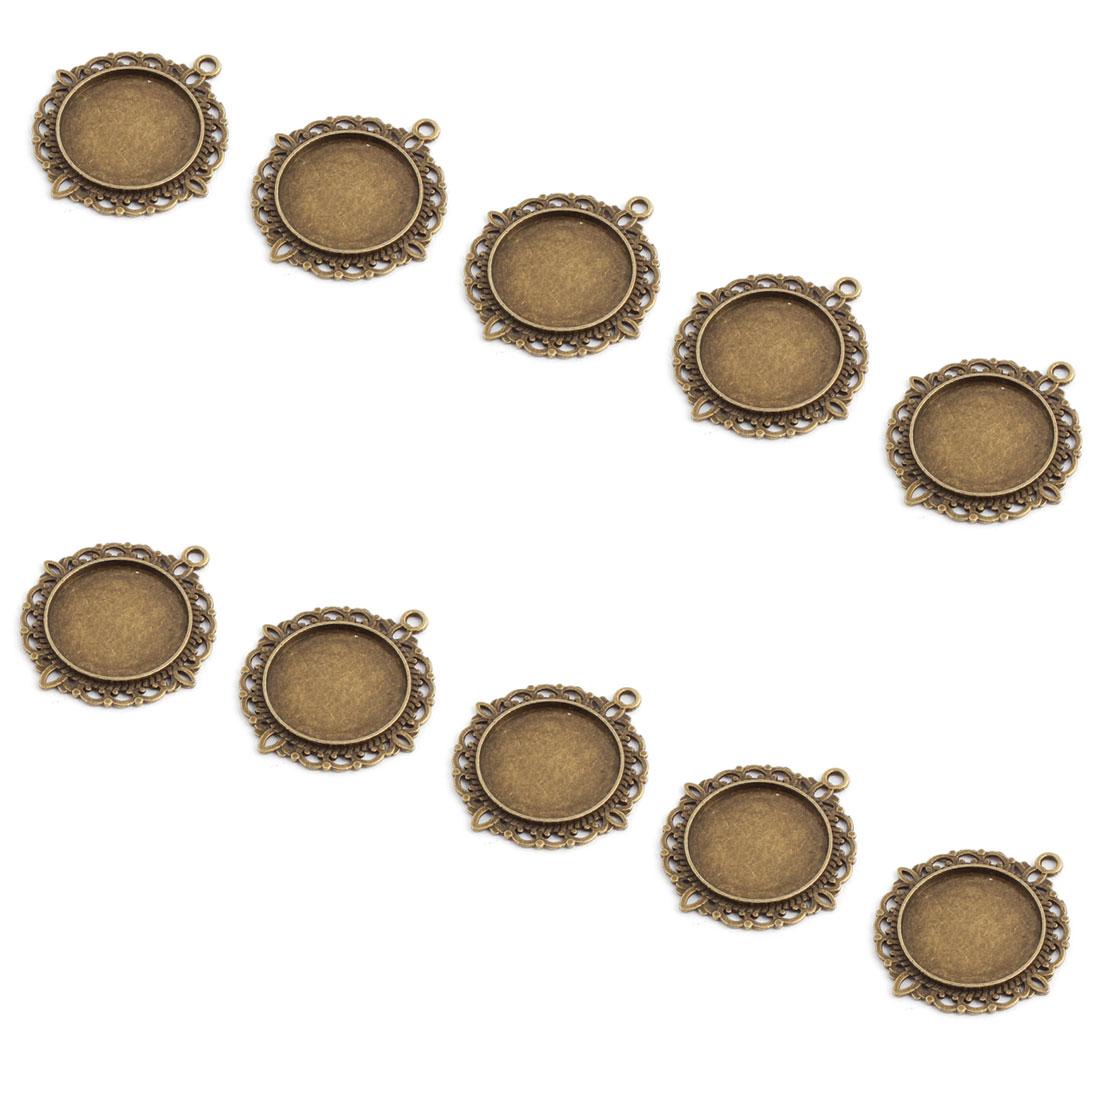 Photo Jewelry Copper Alloy Vintage Style Pendant Trays Bronze Tone 20mm Inner Dia 10pcs